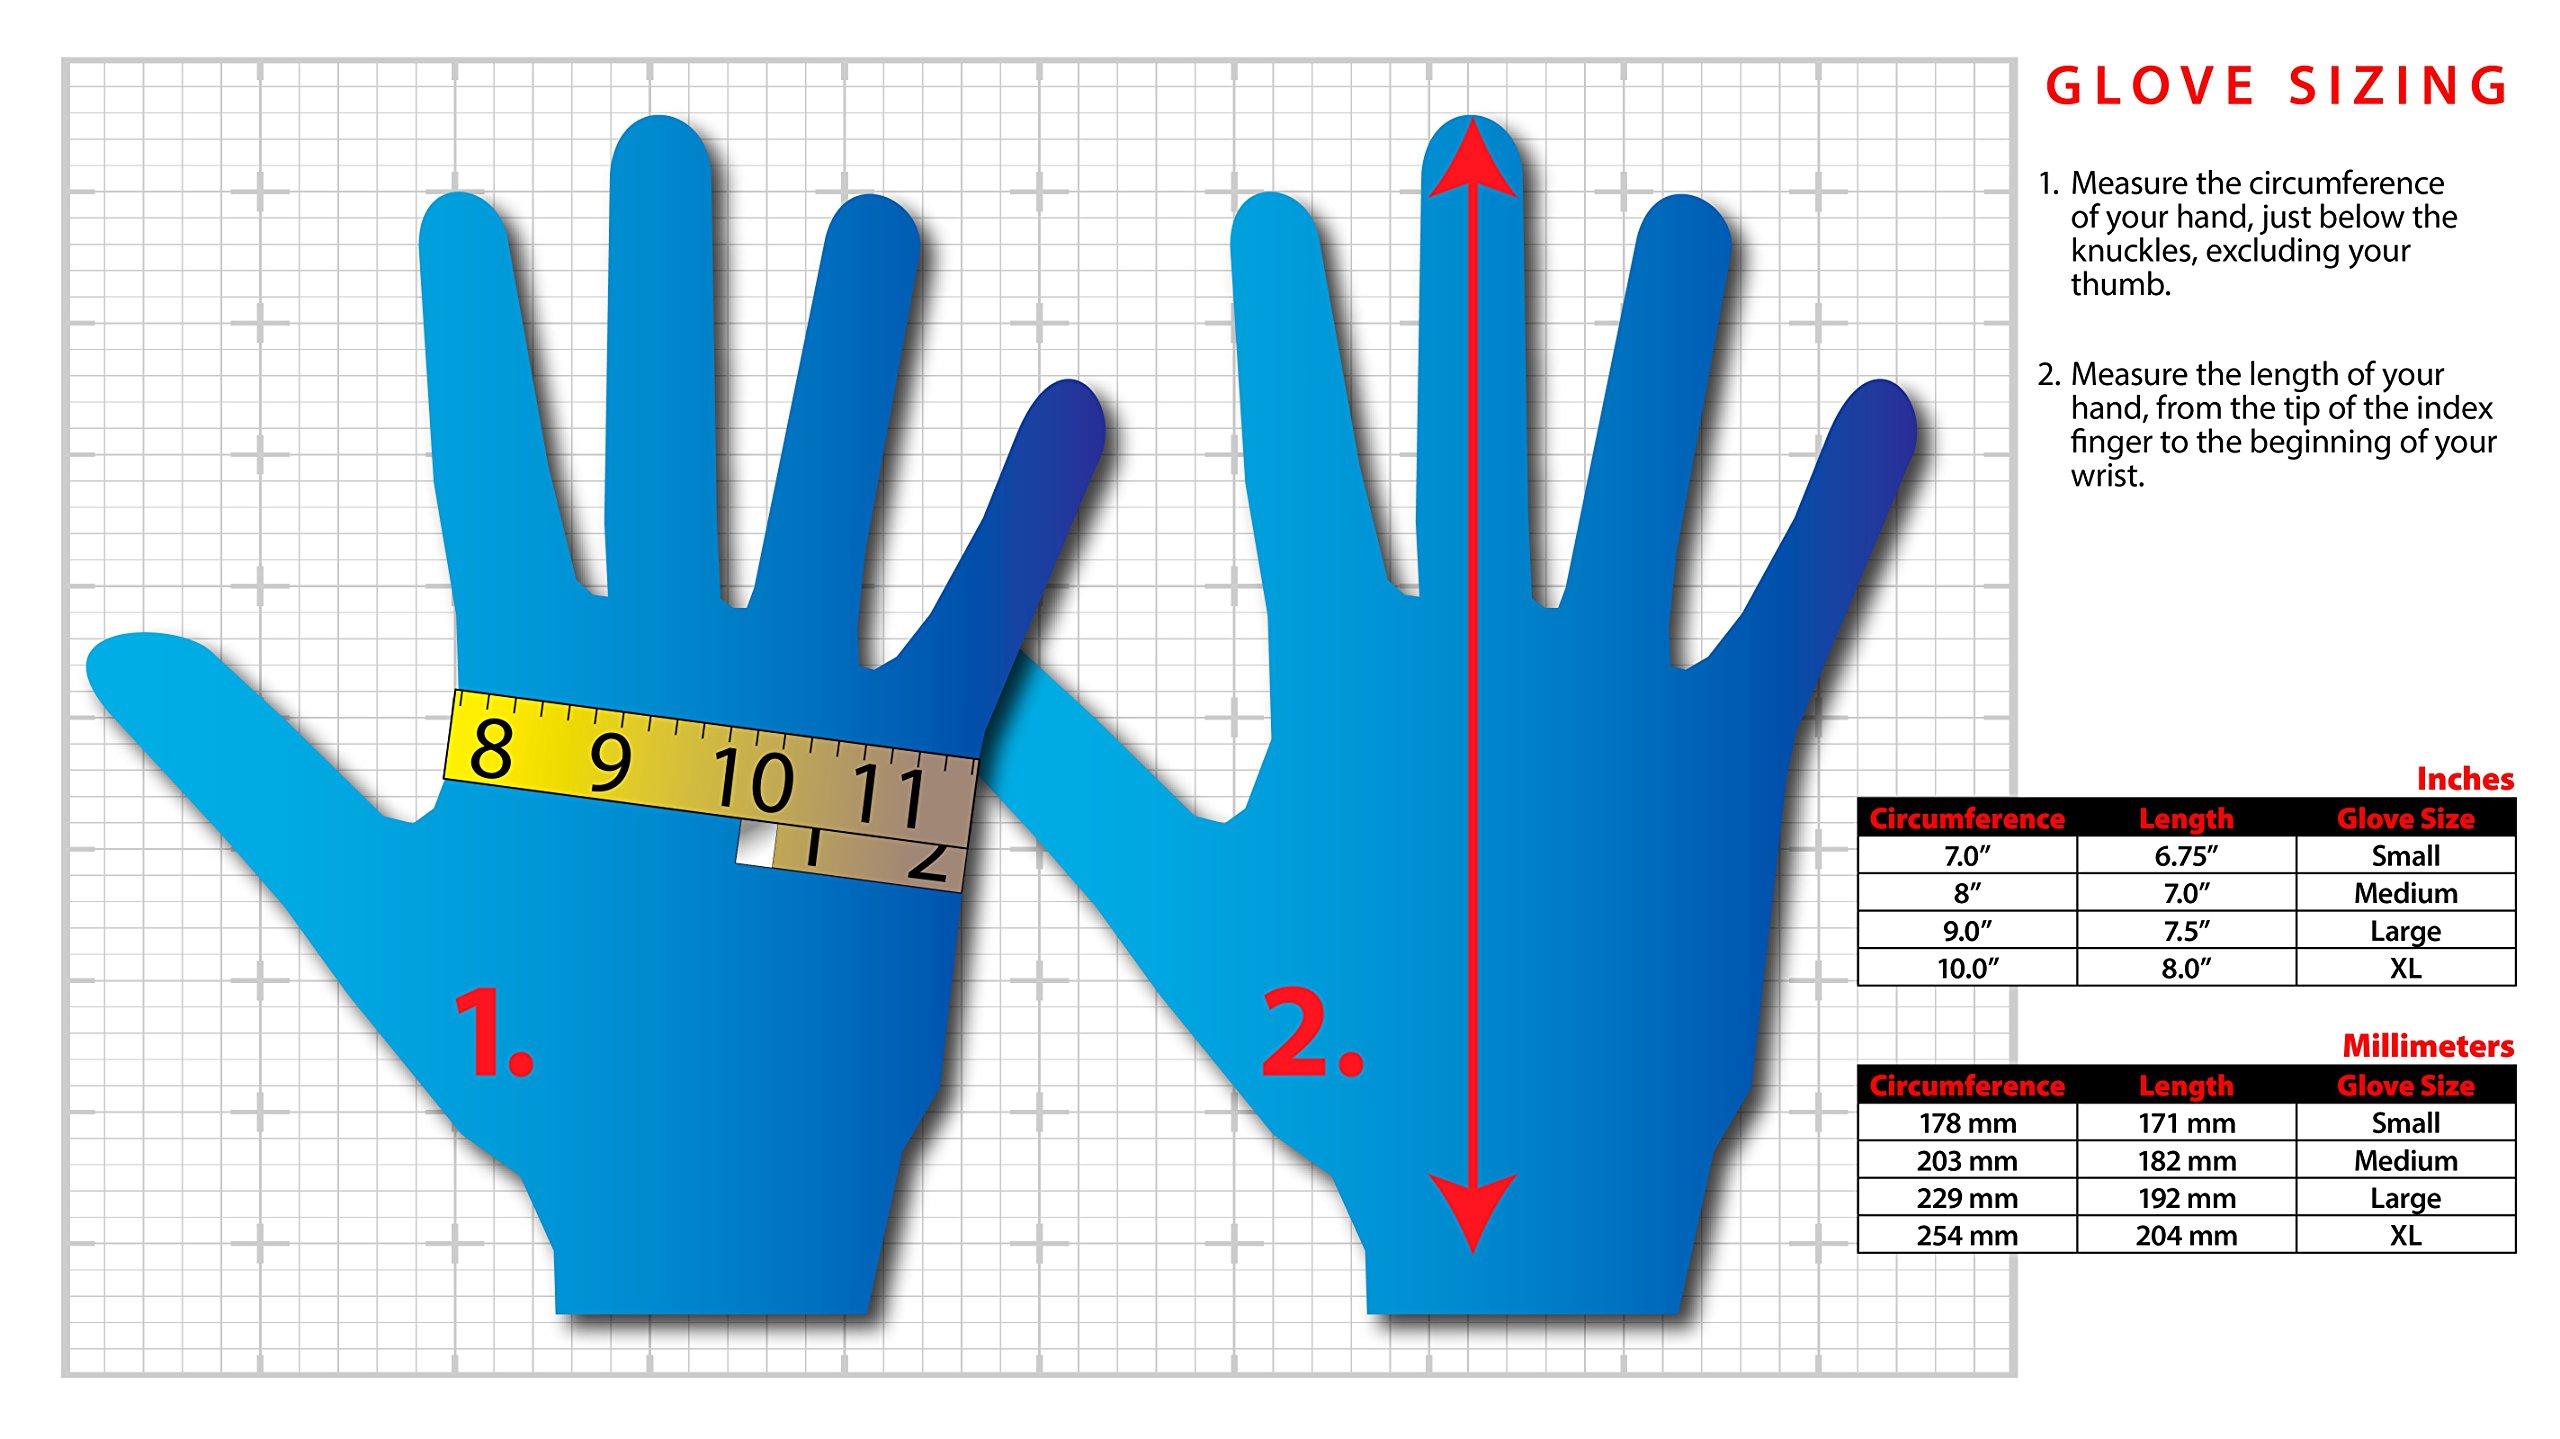 Lakeland 7-2506 SpiderGrip Lightweight Polyester Latex Dipped Glove, Work, Medium, Black (12 Pair)